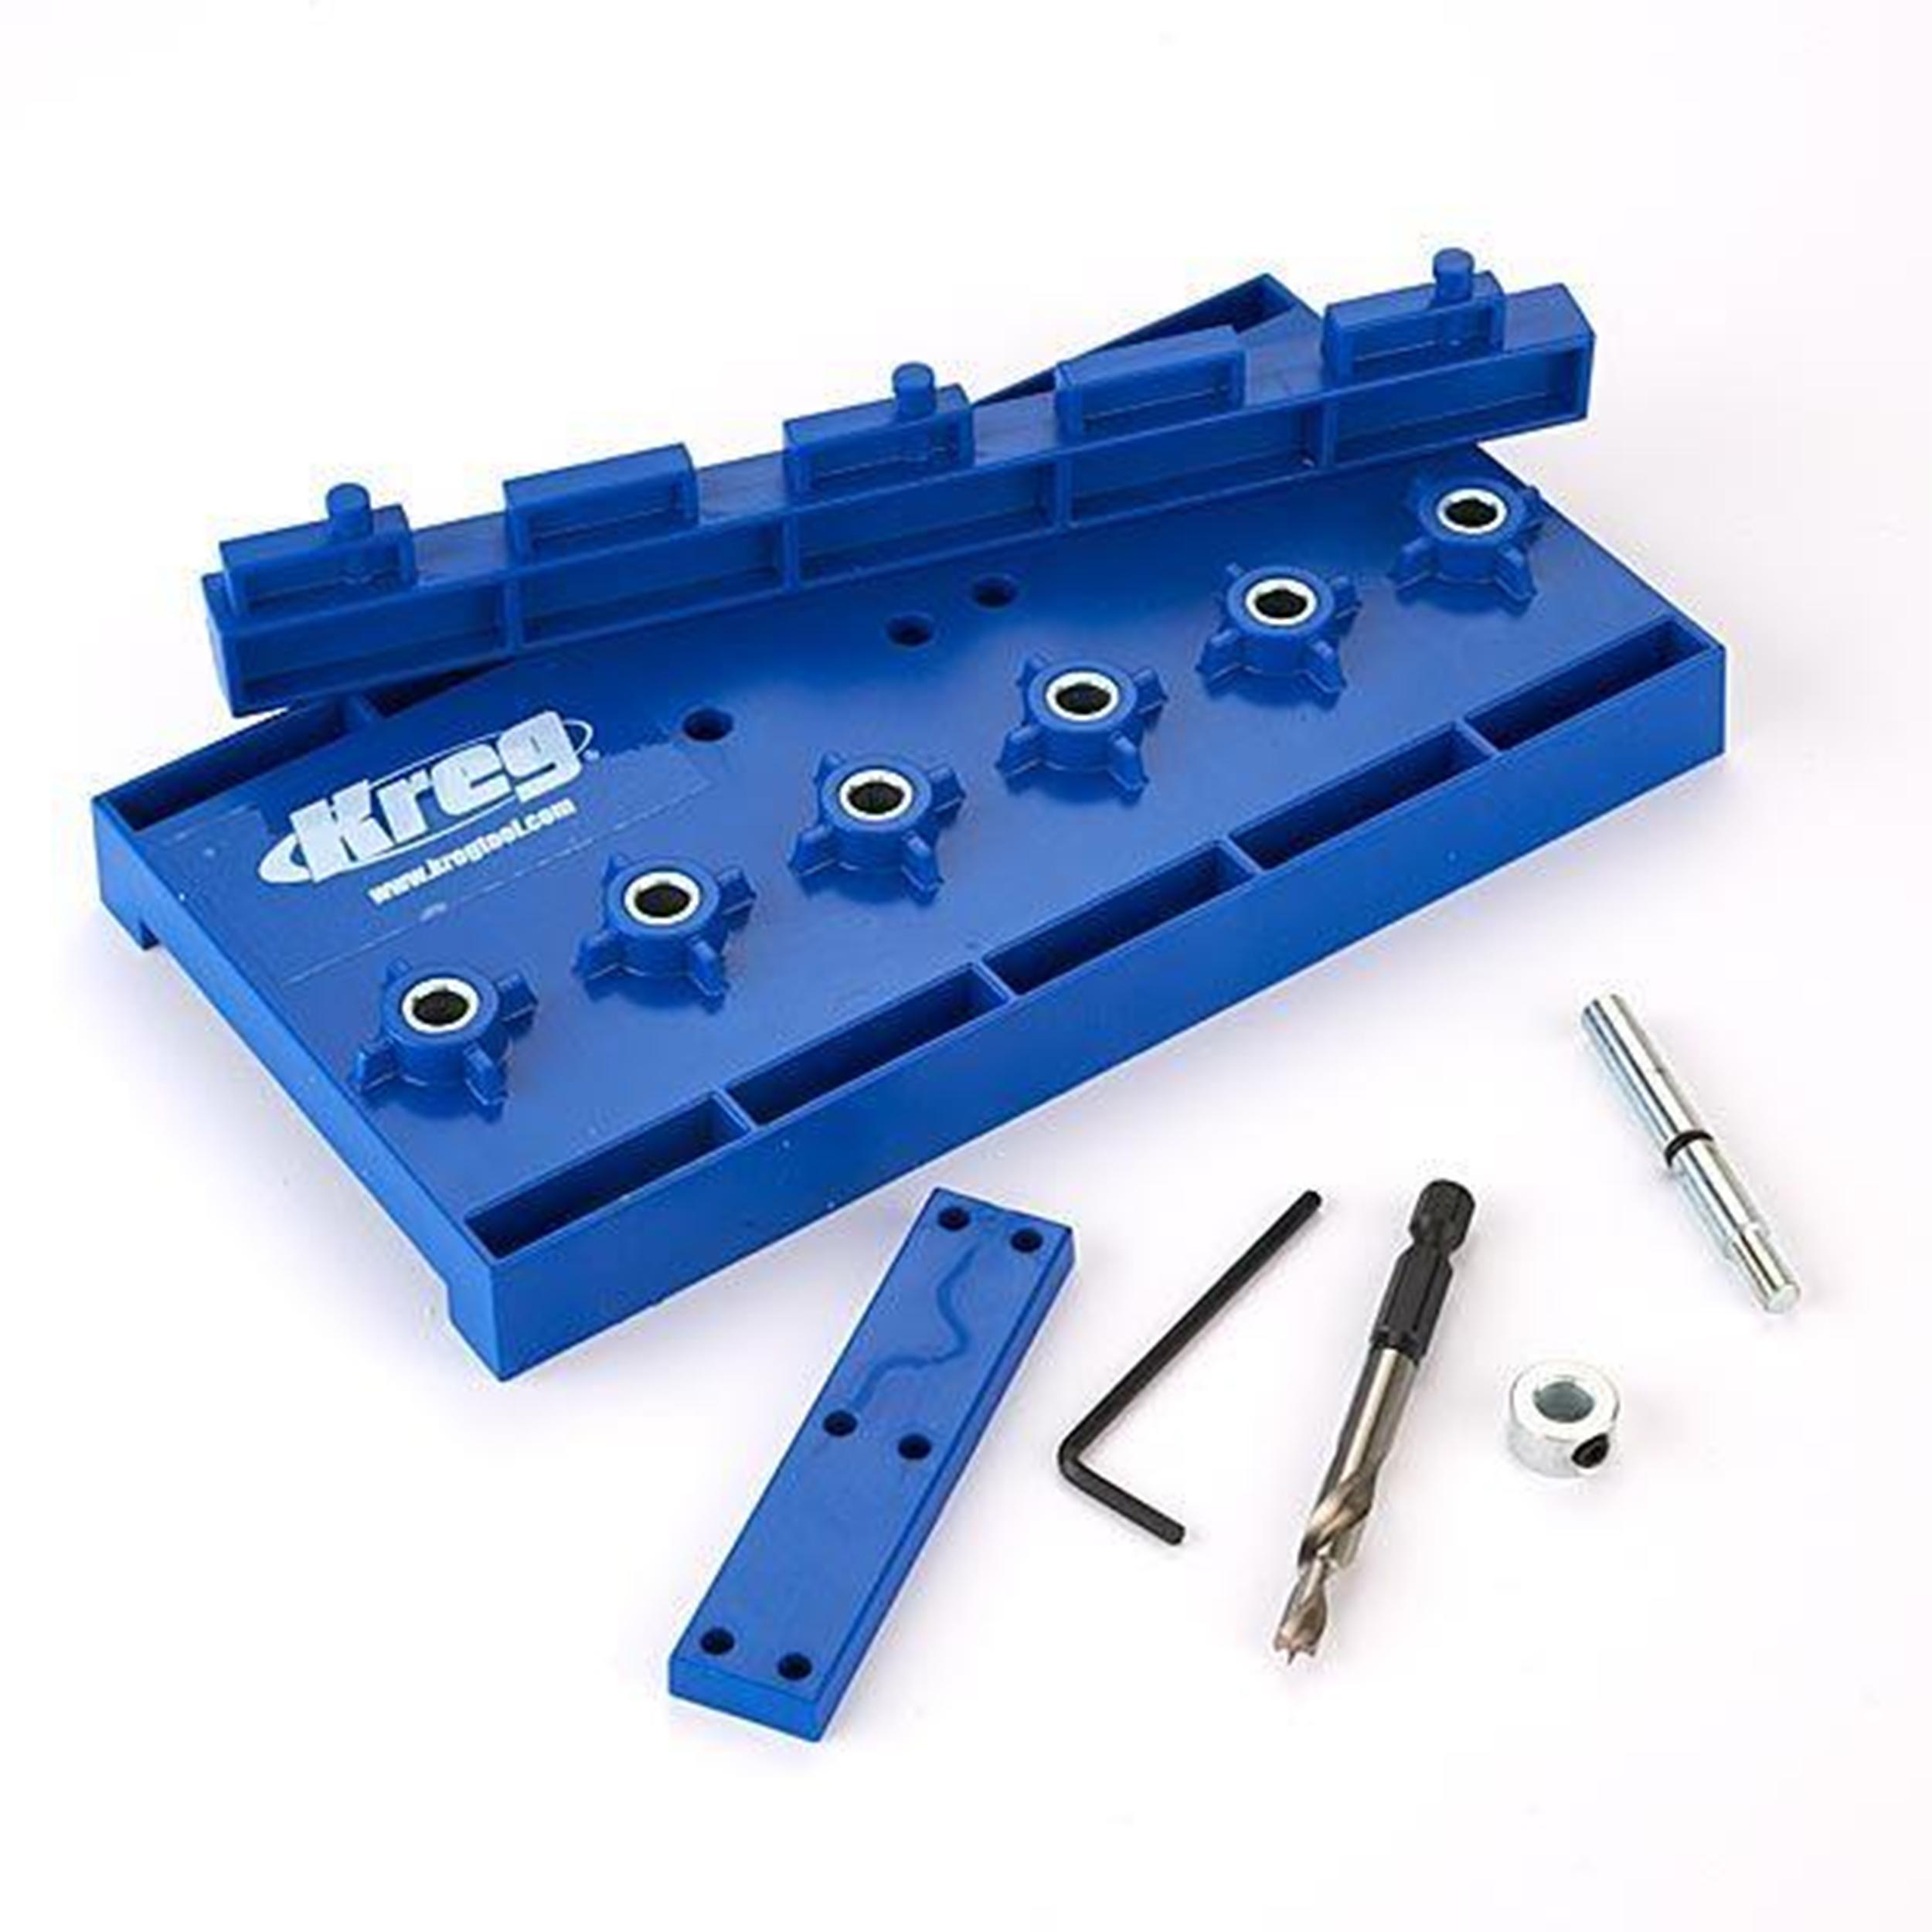 32mm Spacing Shelf Pin Jig With 5mm Drill Bit